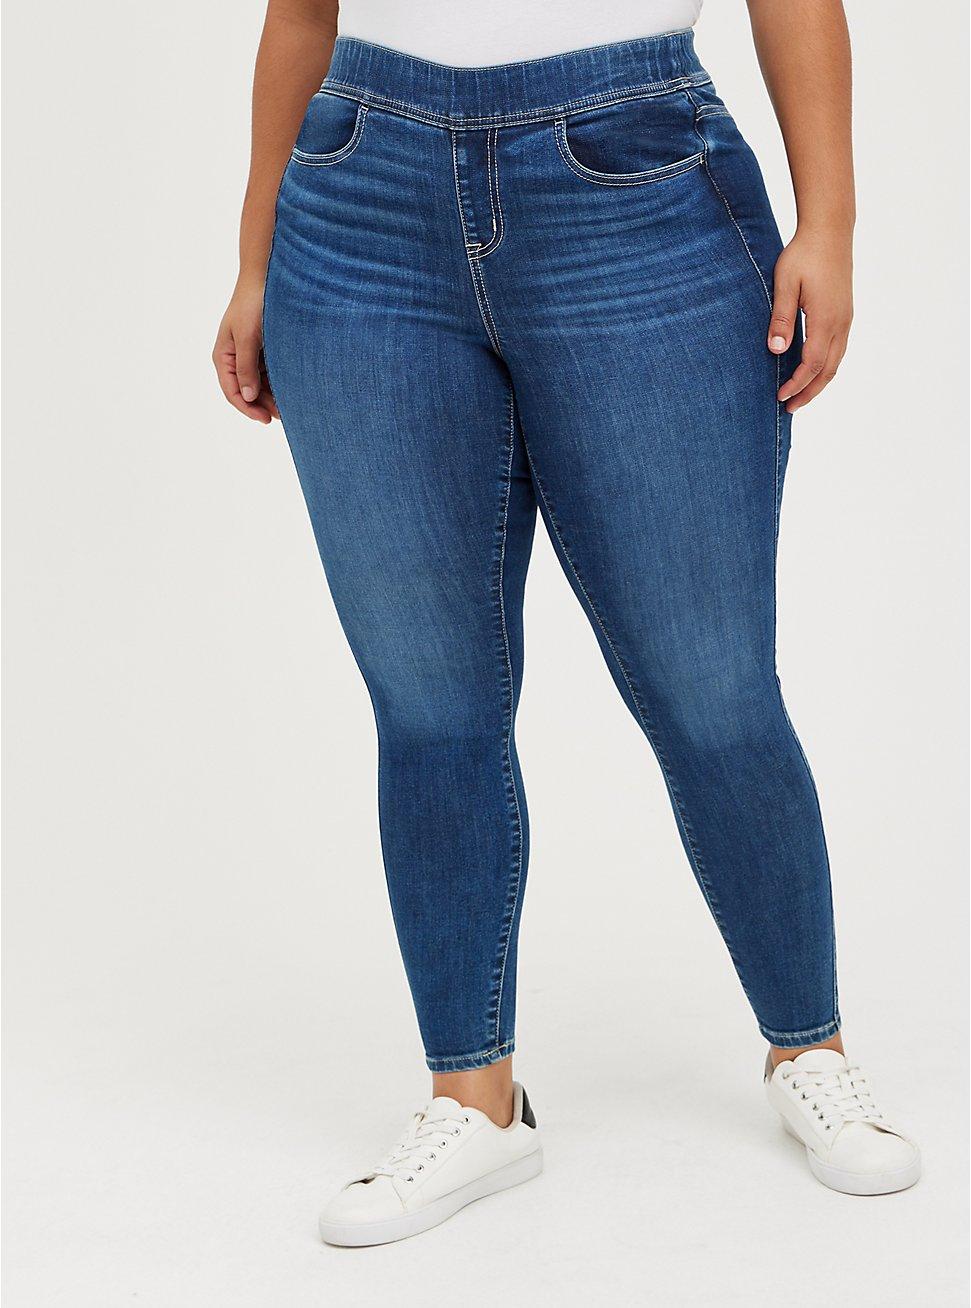 Lean Jean - Super Soft Medium Wash, JUPITER, hi-res